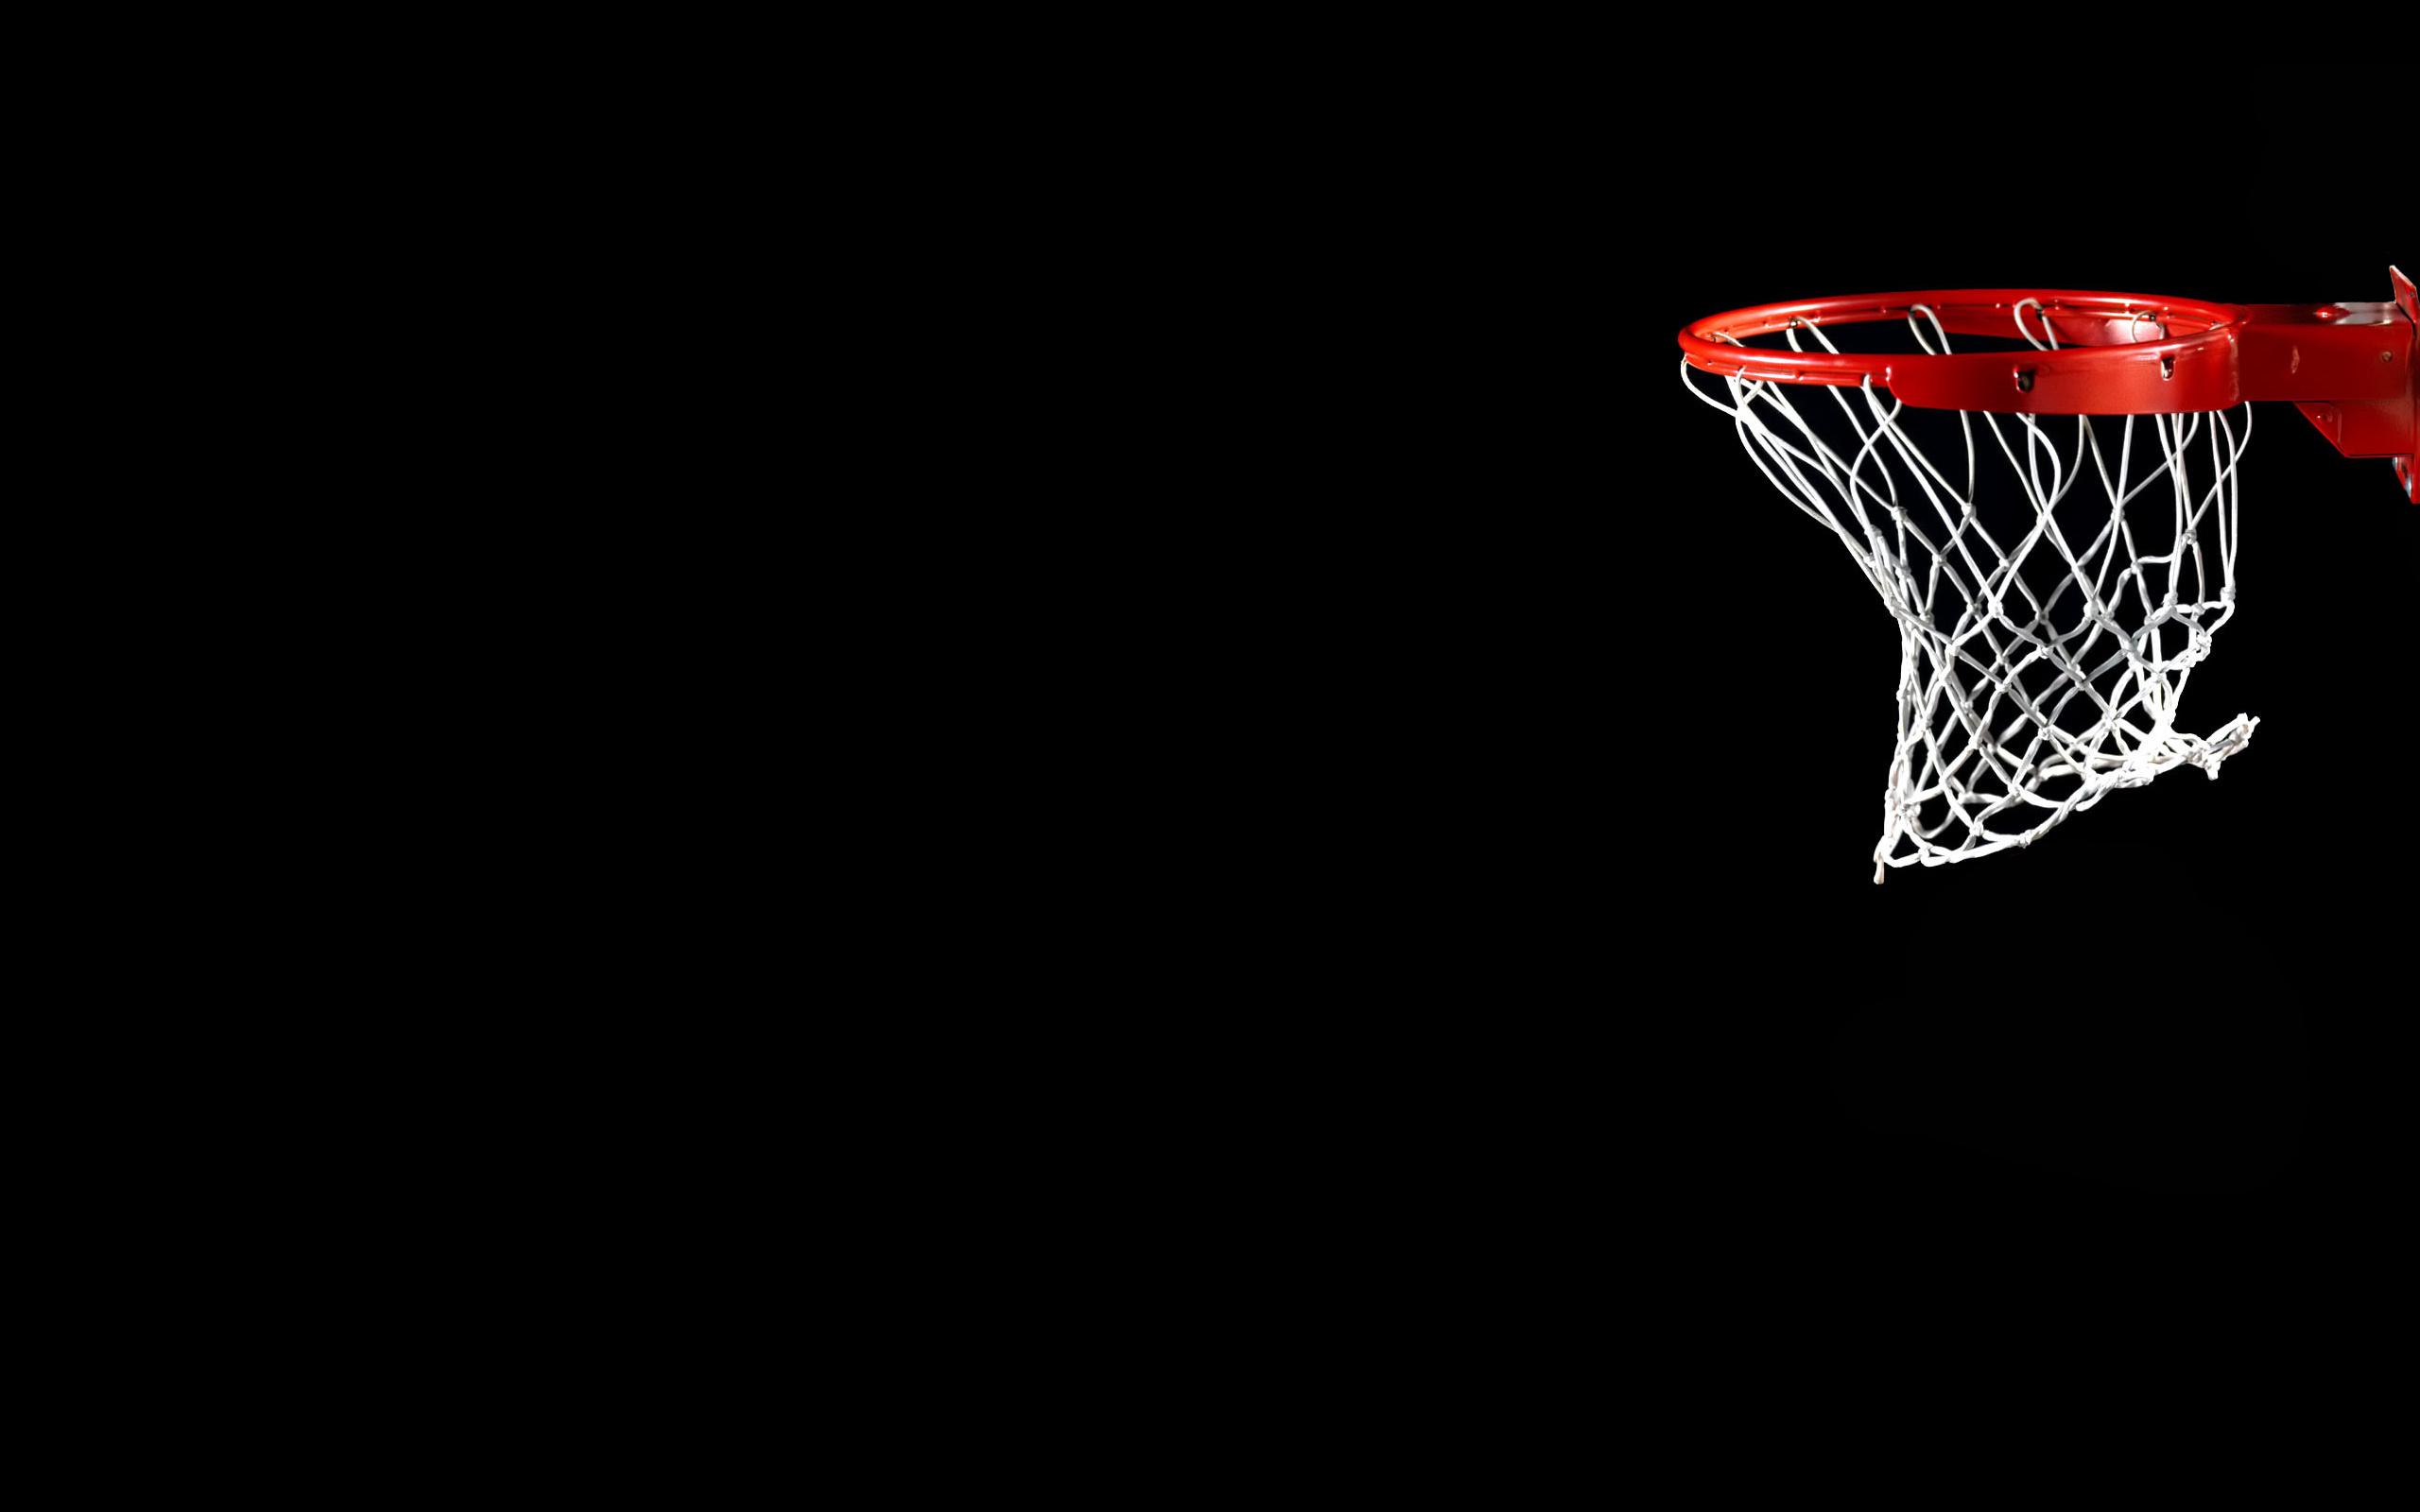 картинки на рабочий стол баскетбол